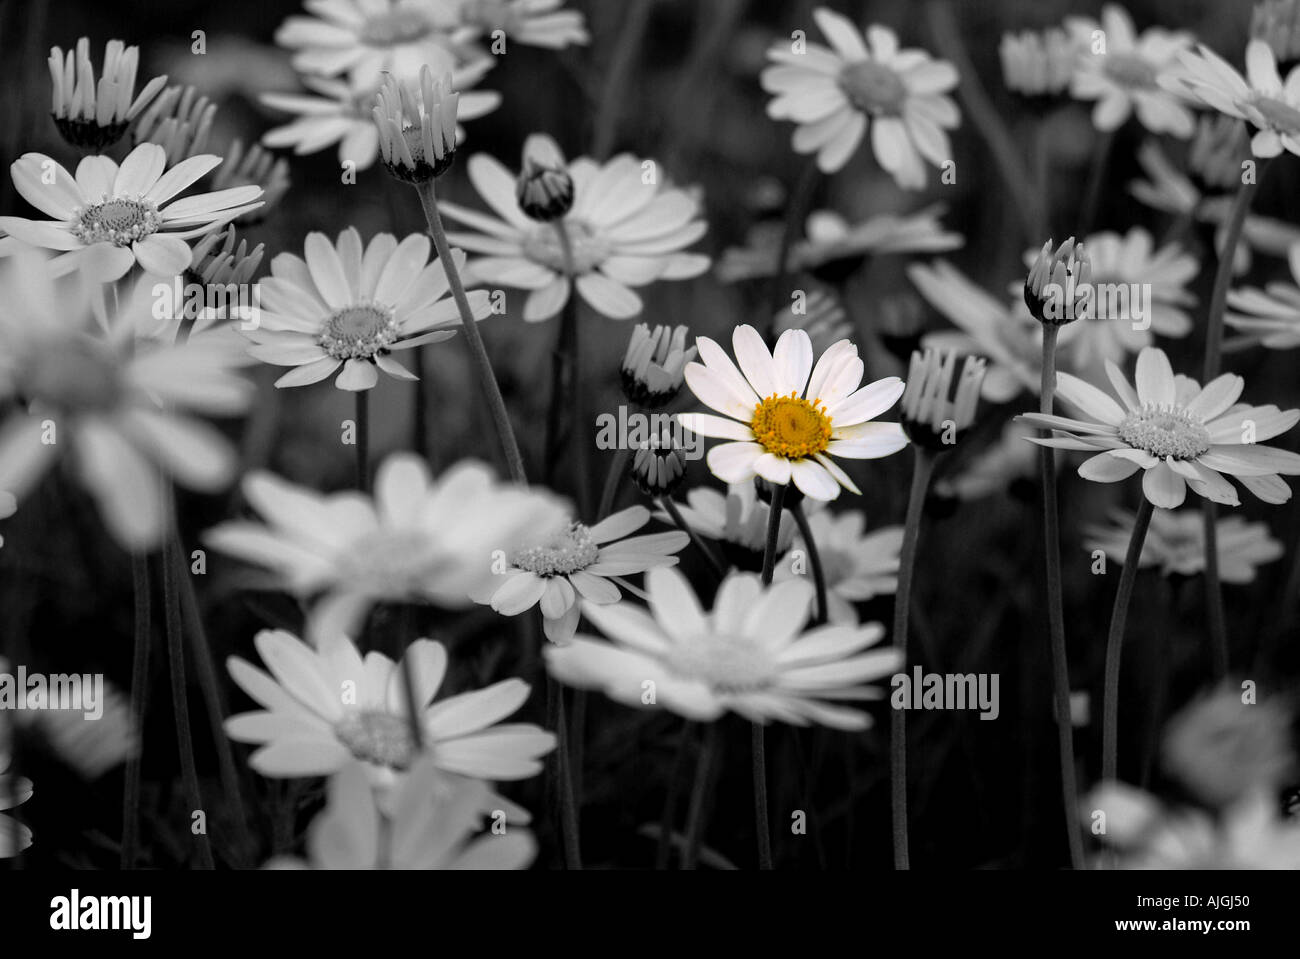 Black And White Single Flower